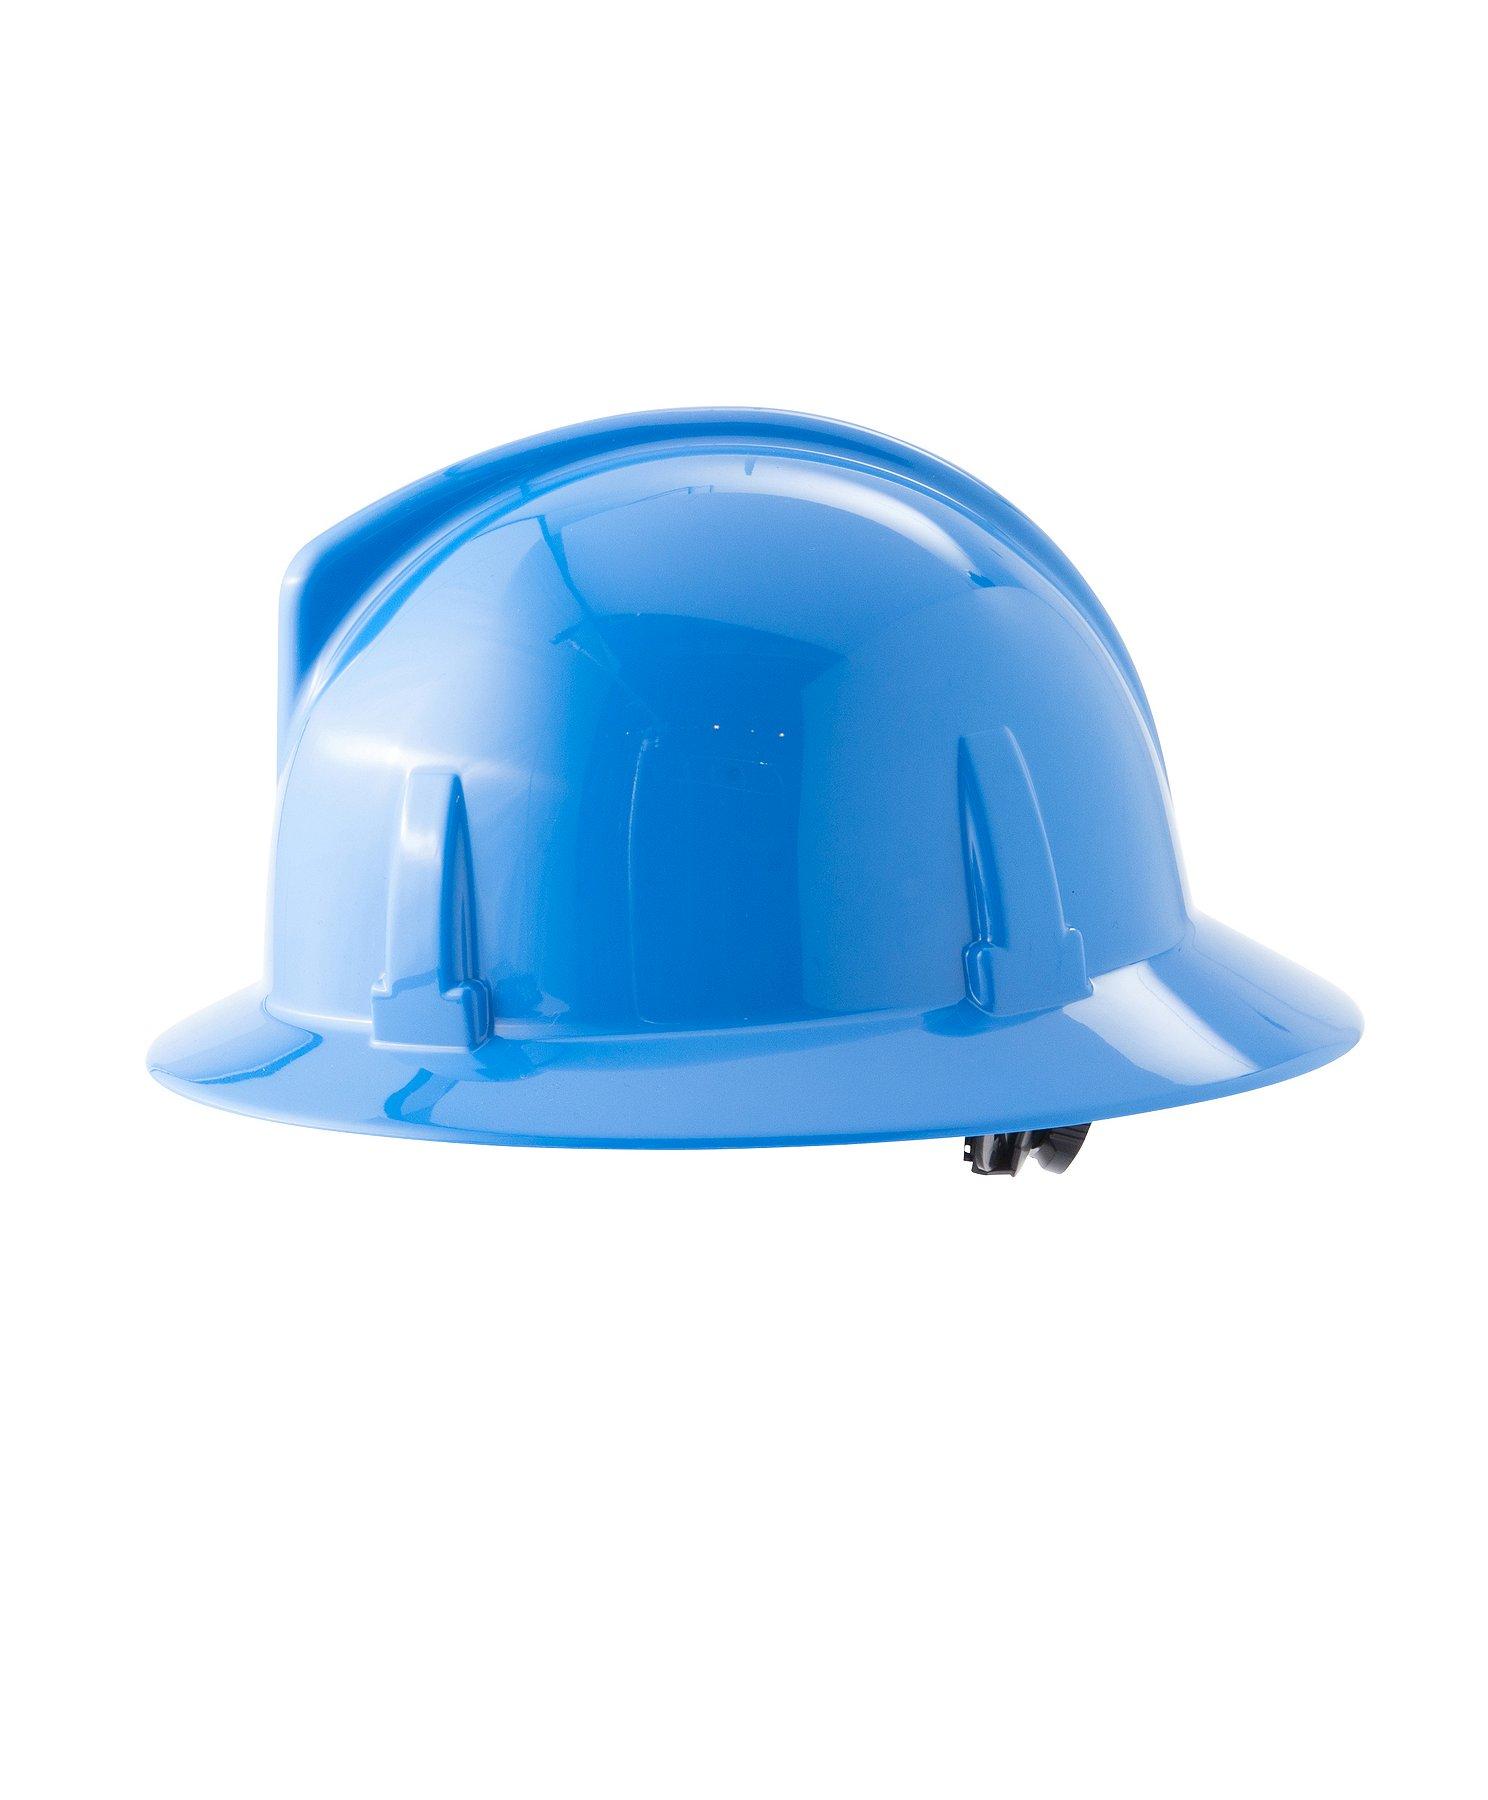 MSA/ANSI Topguard Hard Hat